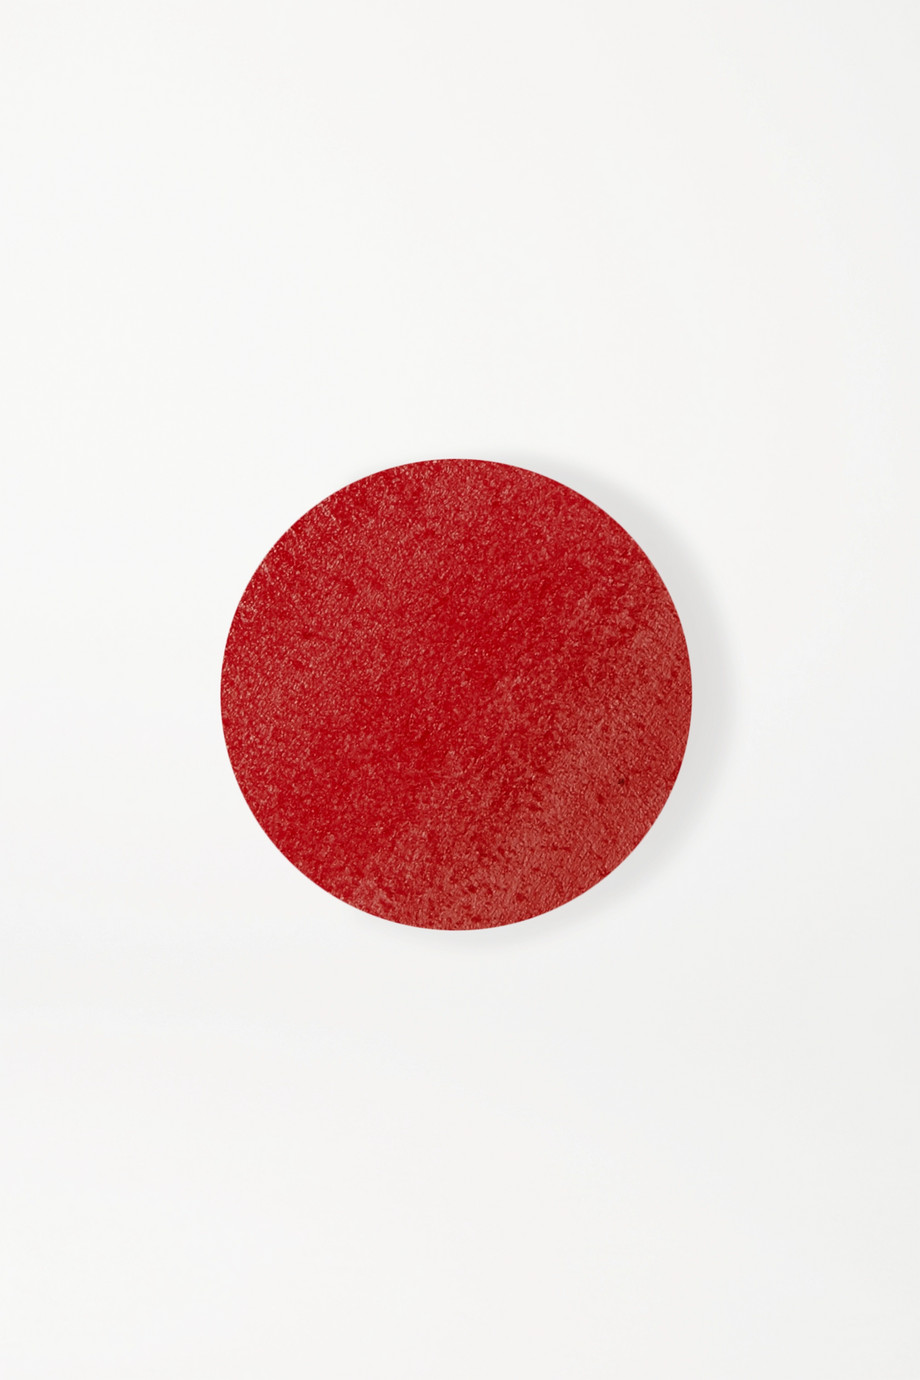 La Bouche Rouge Matte Lipstick Refill - Regal Red